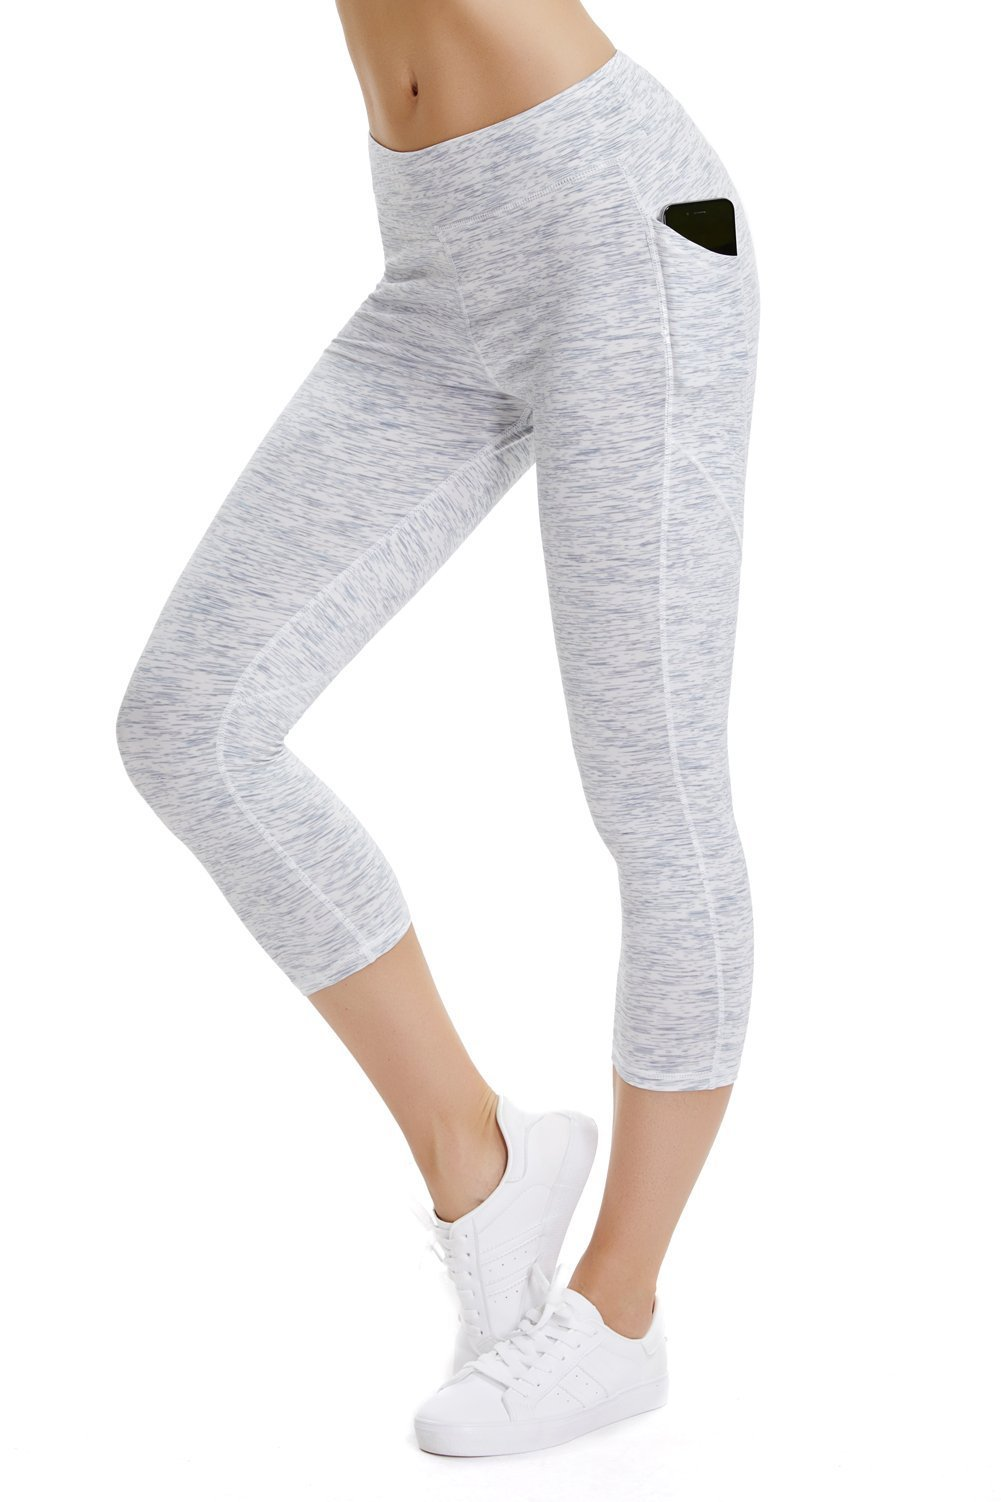 THE GYM PEOPLE Compression Yoga Capri Legings for Women, Heart Shape Workout Pants with Pocket Super Power Flex Fabric (Medium, 13/White)